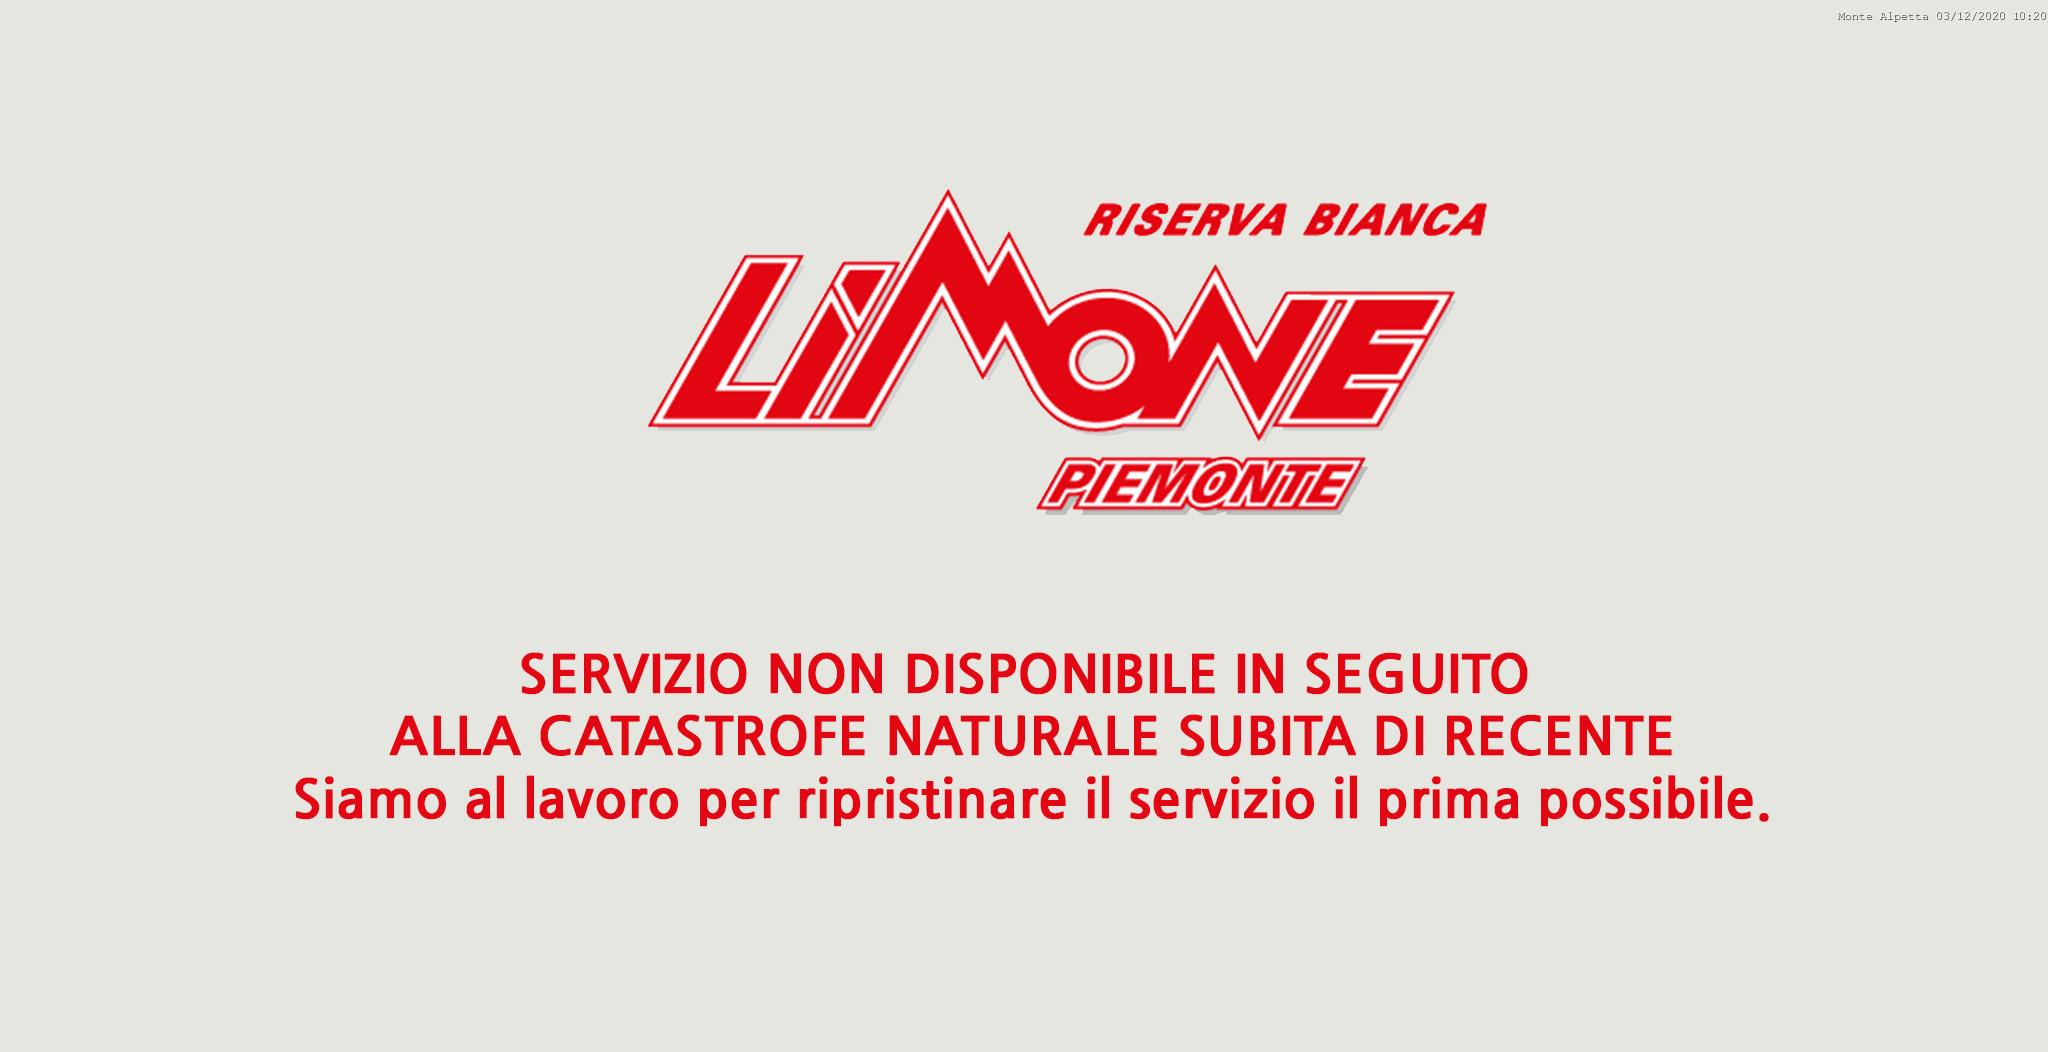 Limone - Riserva Bianca / Piste